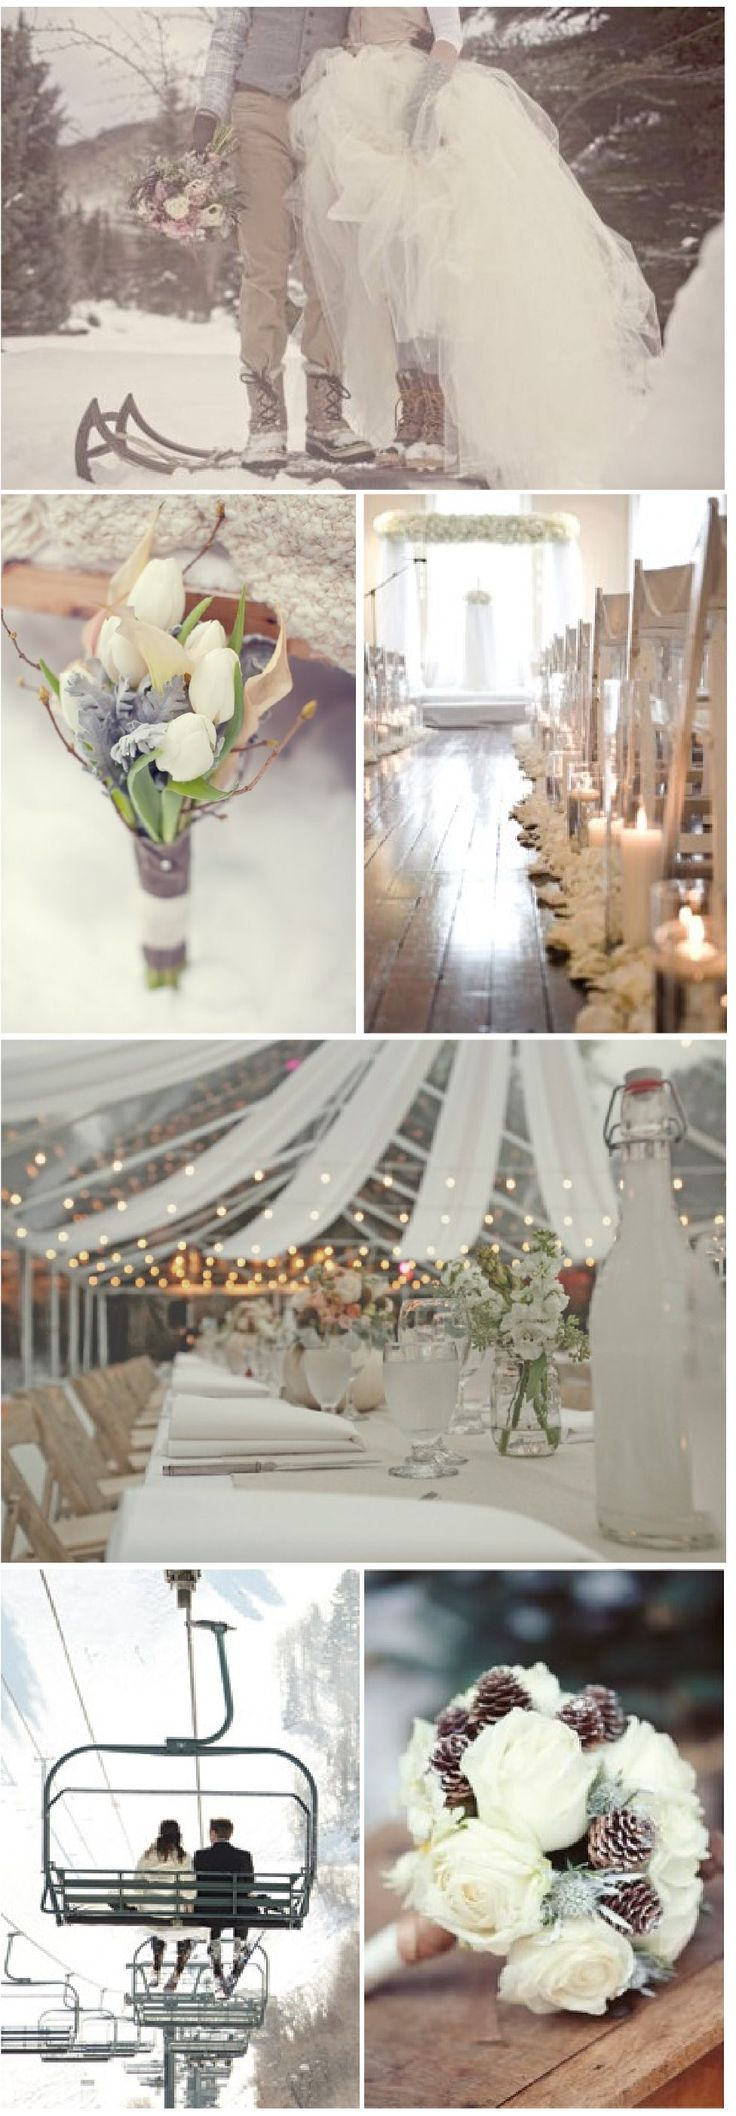 Winter Wedding Ideas - A winter wonderland snow wedding